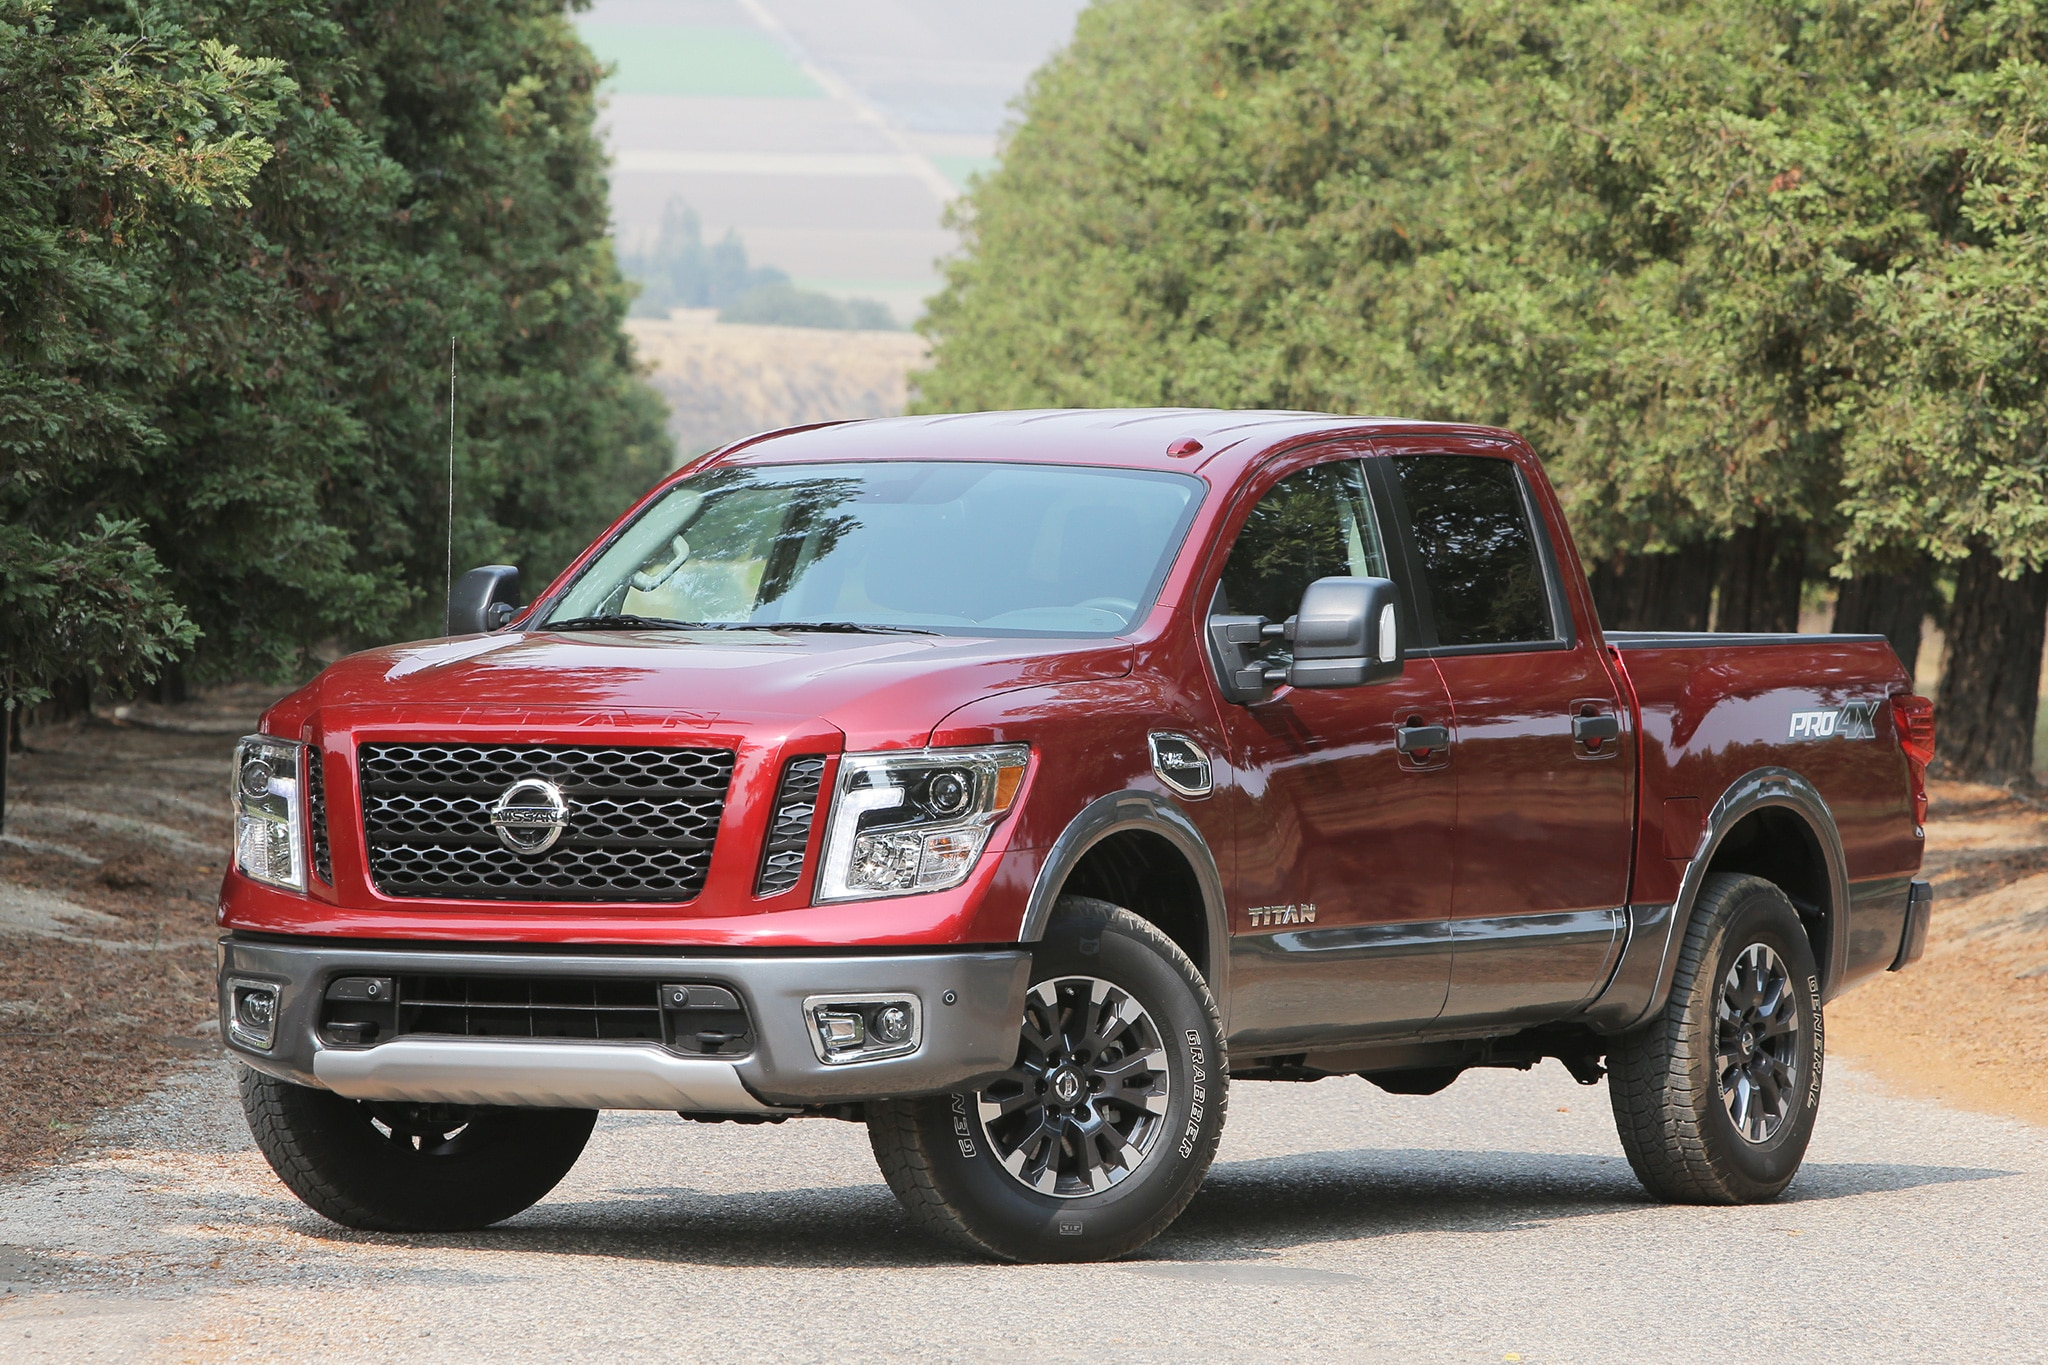 http://st.automobilemag.com/uploads/sites/11/2016/08/2017-Nissan-Titan-front-three-quarter-03.jpg